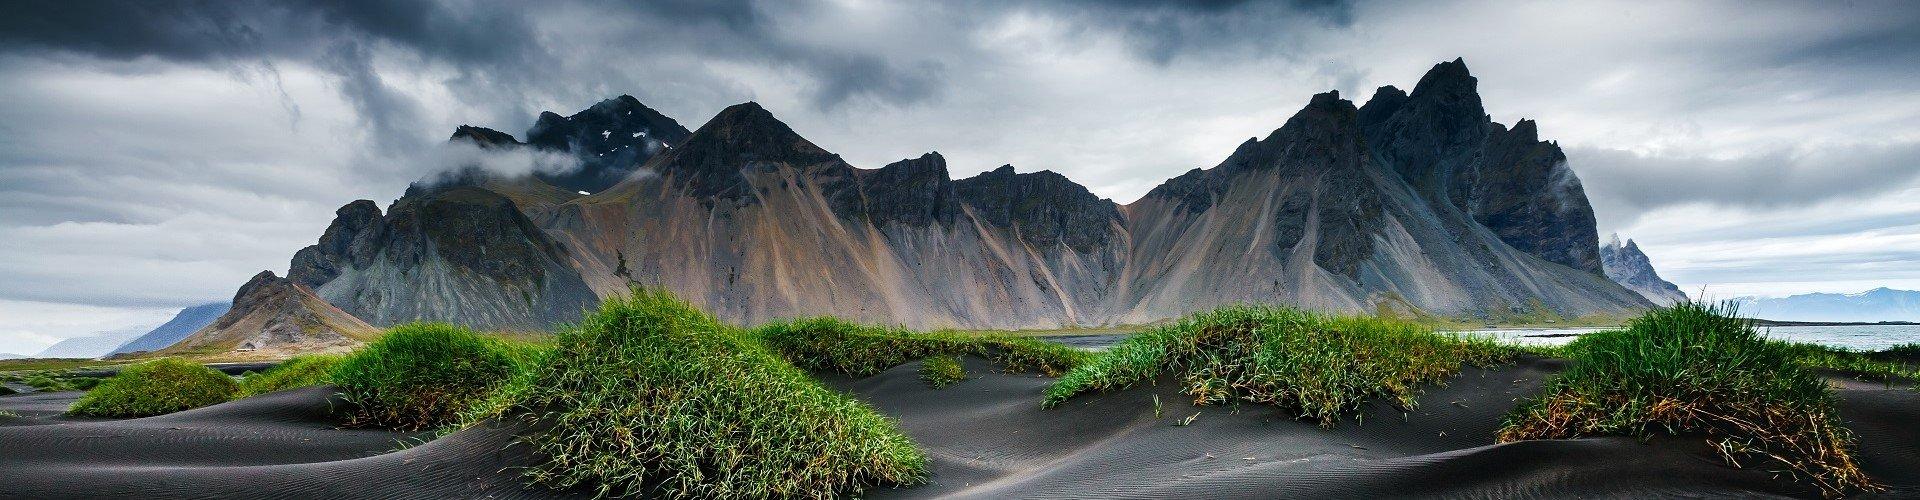 Familienurlaub in Island